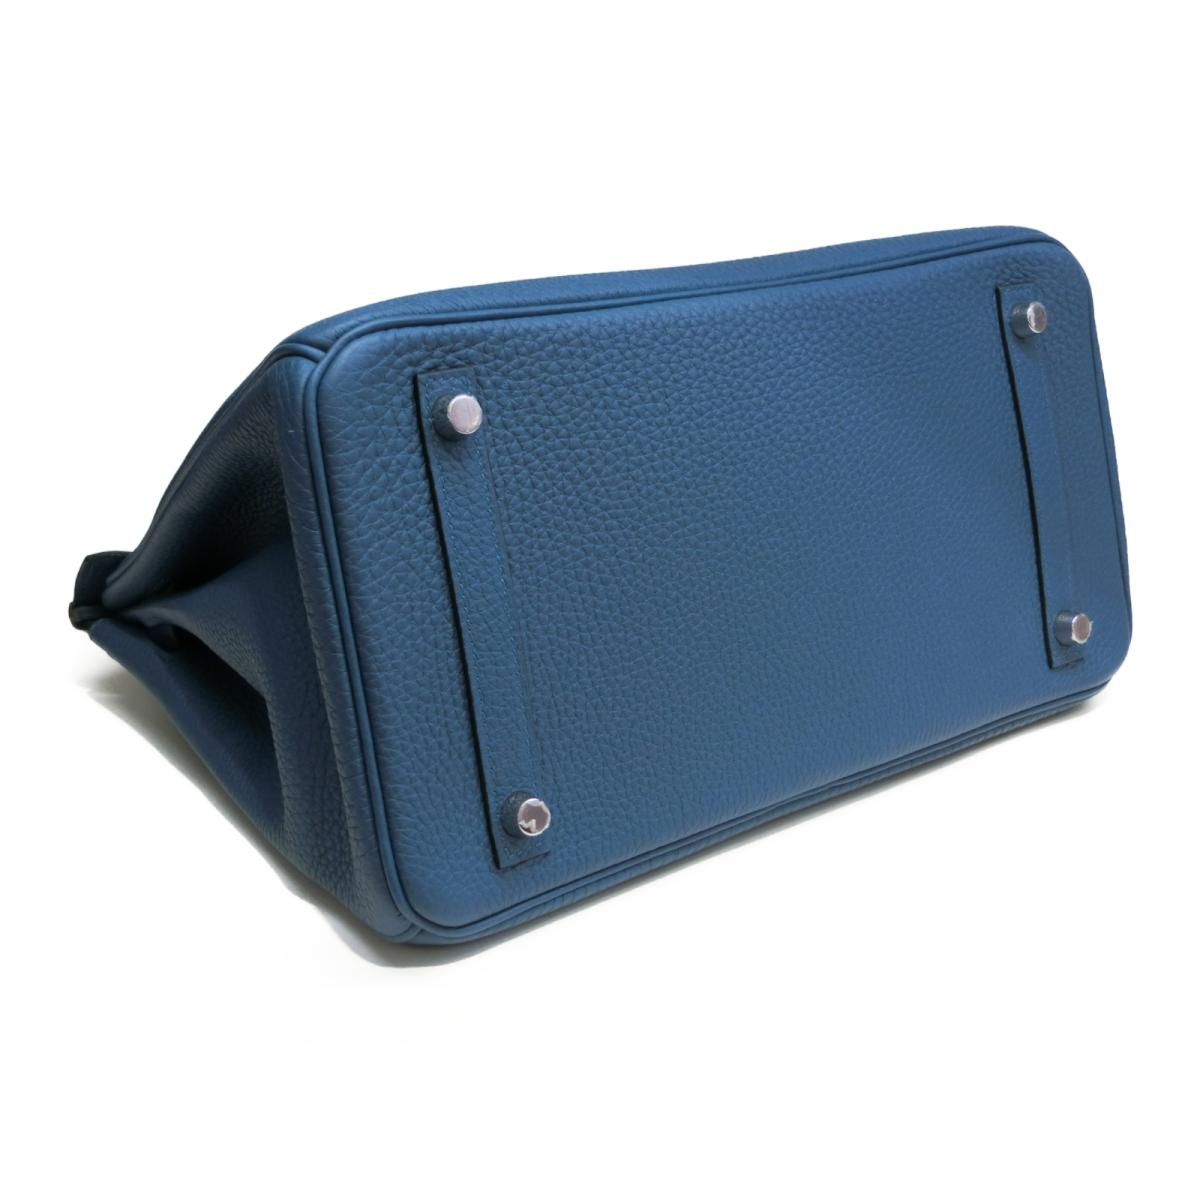 a2fd3f3bed93 BRANDOFF  Auth HERMES Birkin 30 Hand tote bag Togo leather Cobalt ...